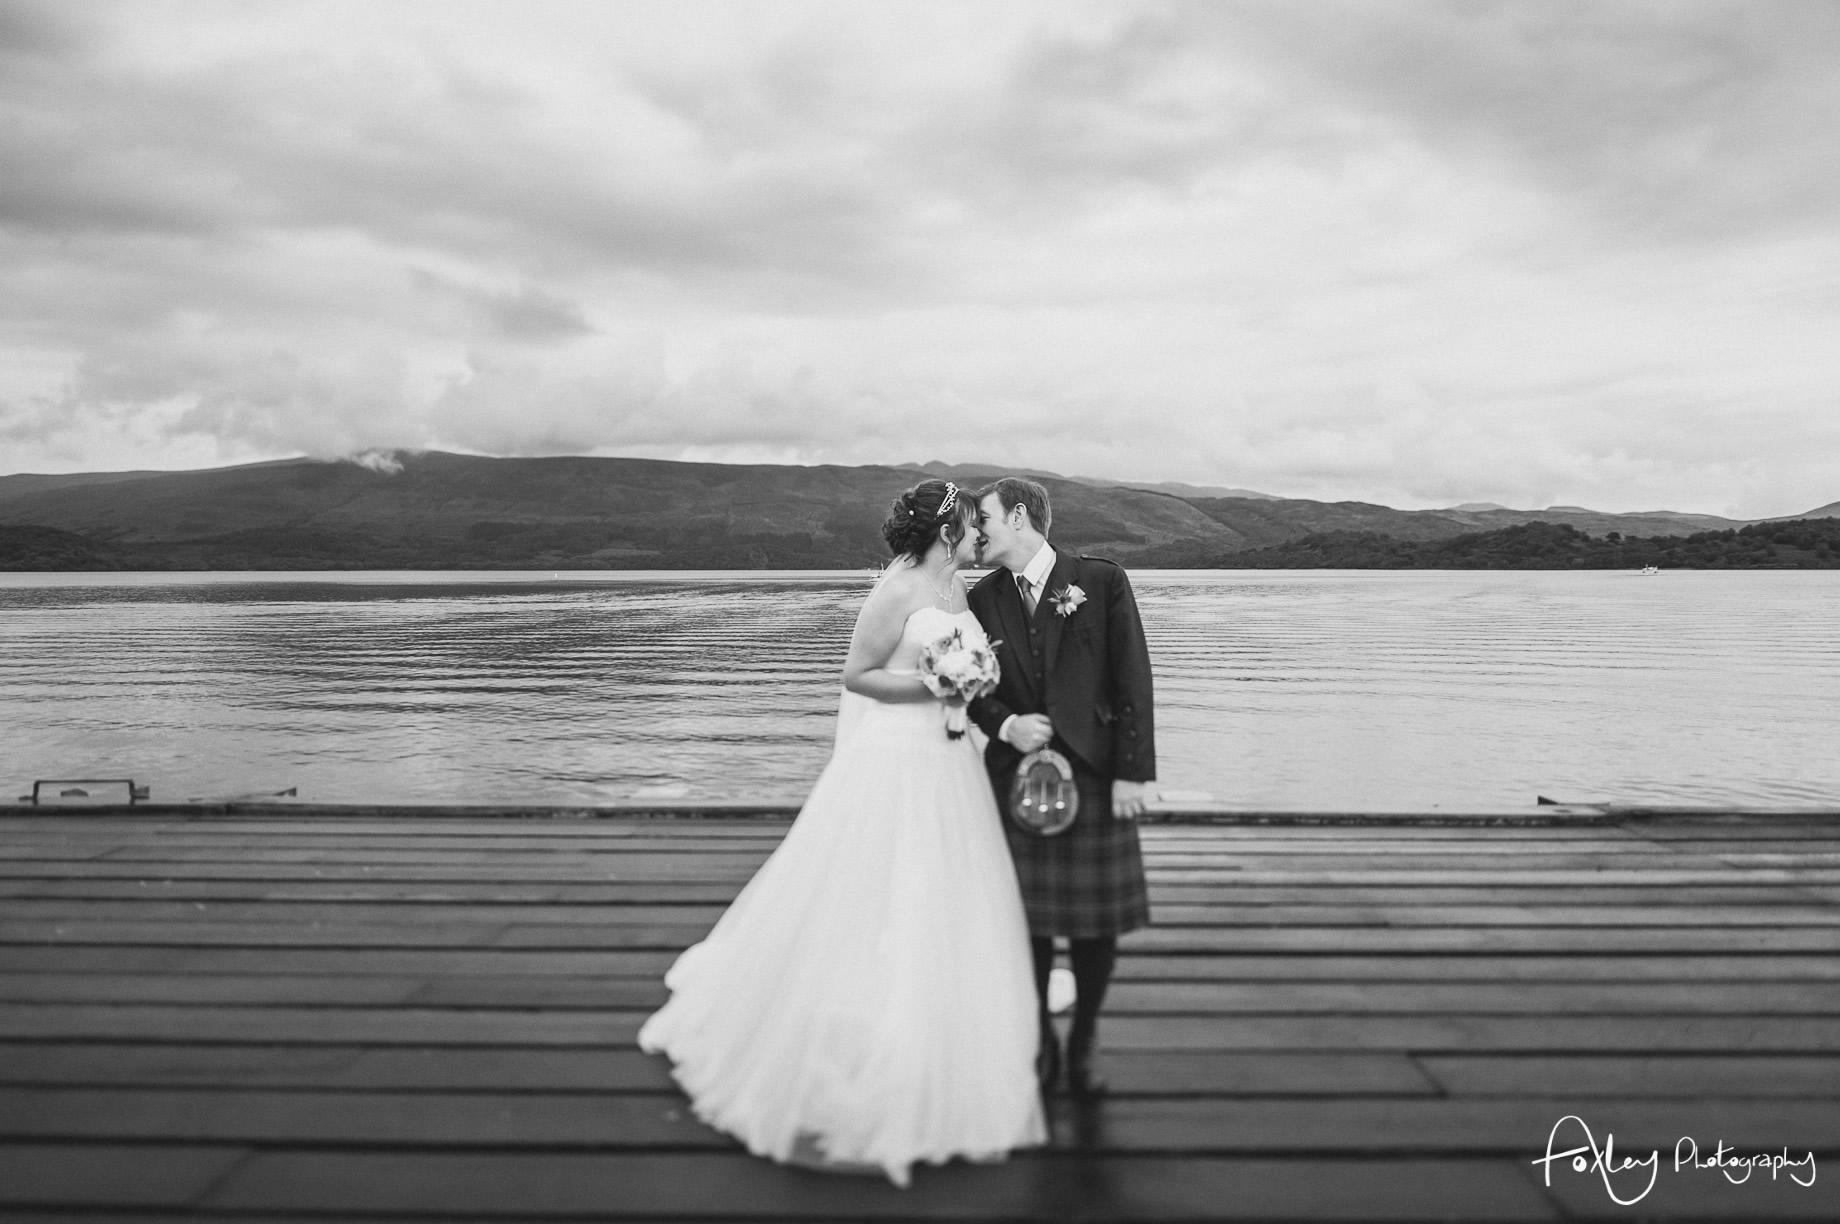 Alys-And-Davids-Wedding-Loch-Lomond-108